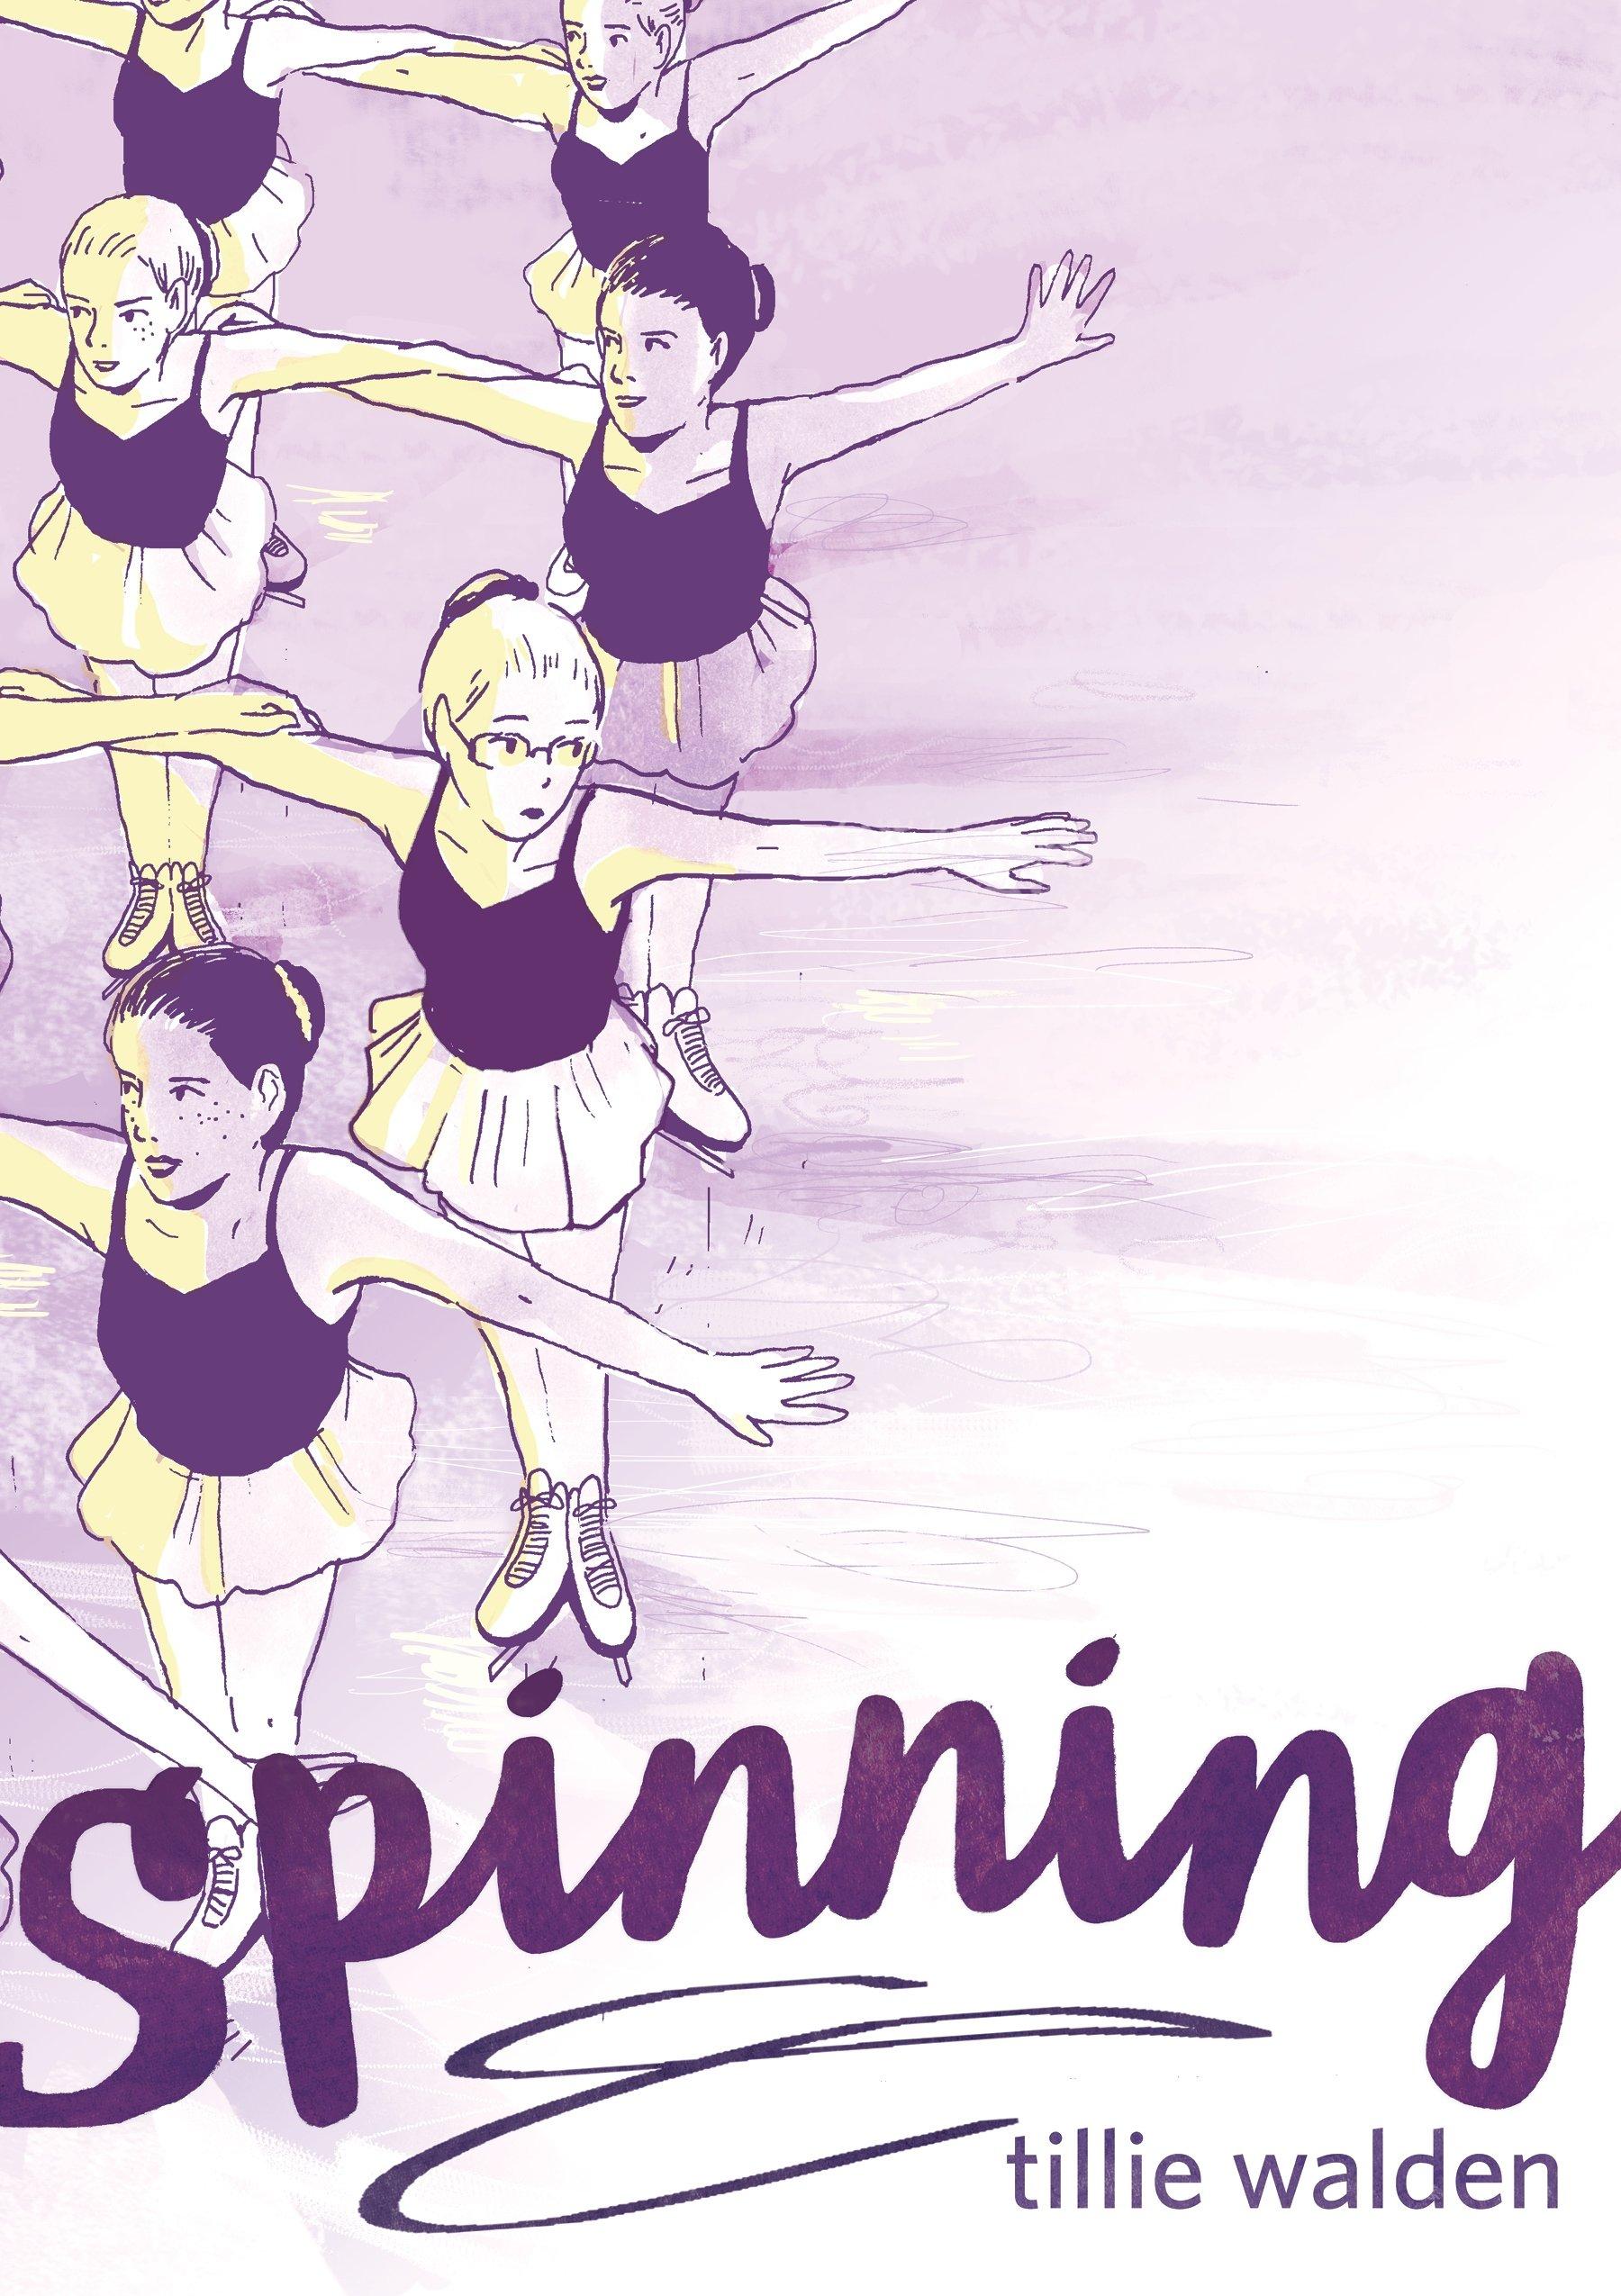 Spinning graphic novel